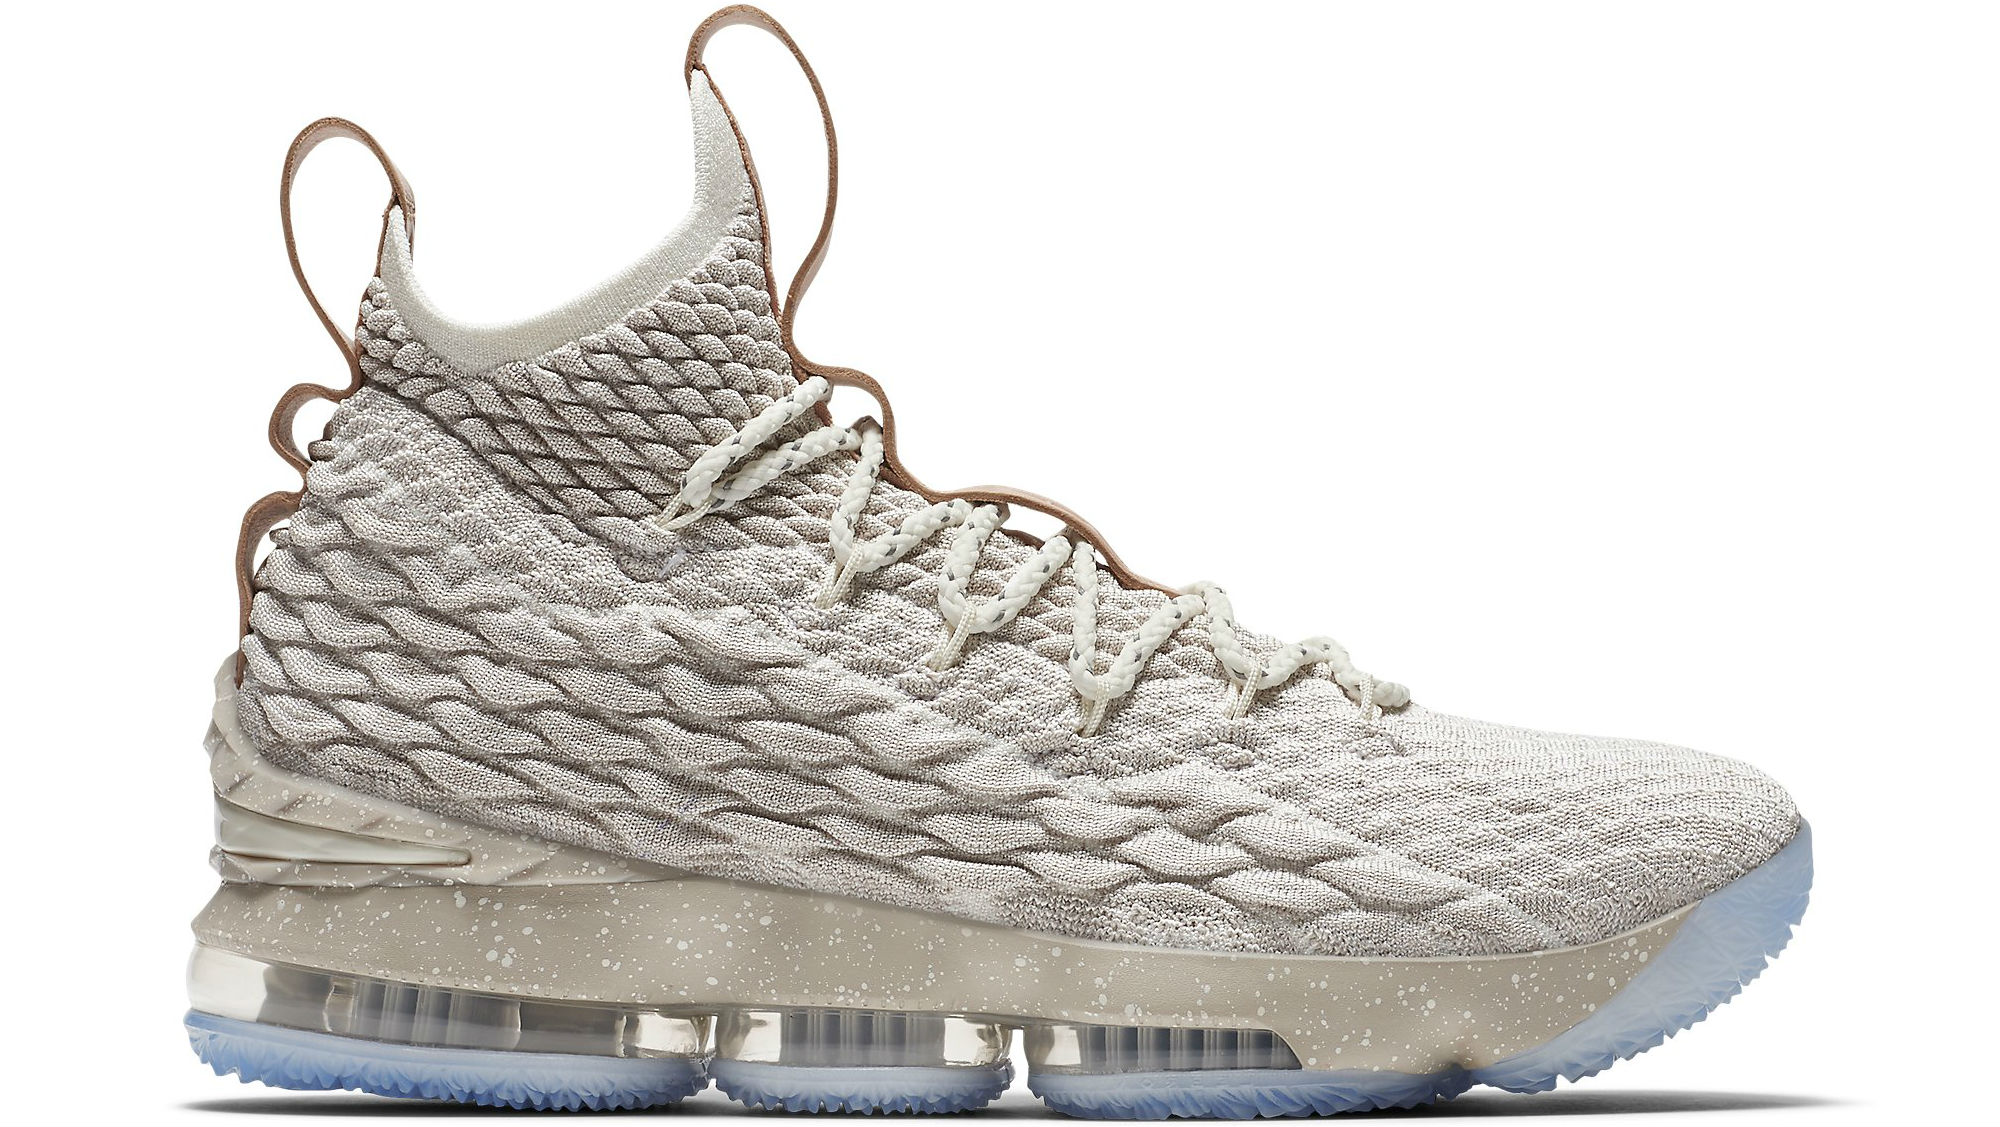 Nike LeBron 15 EP